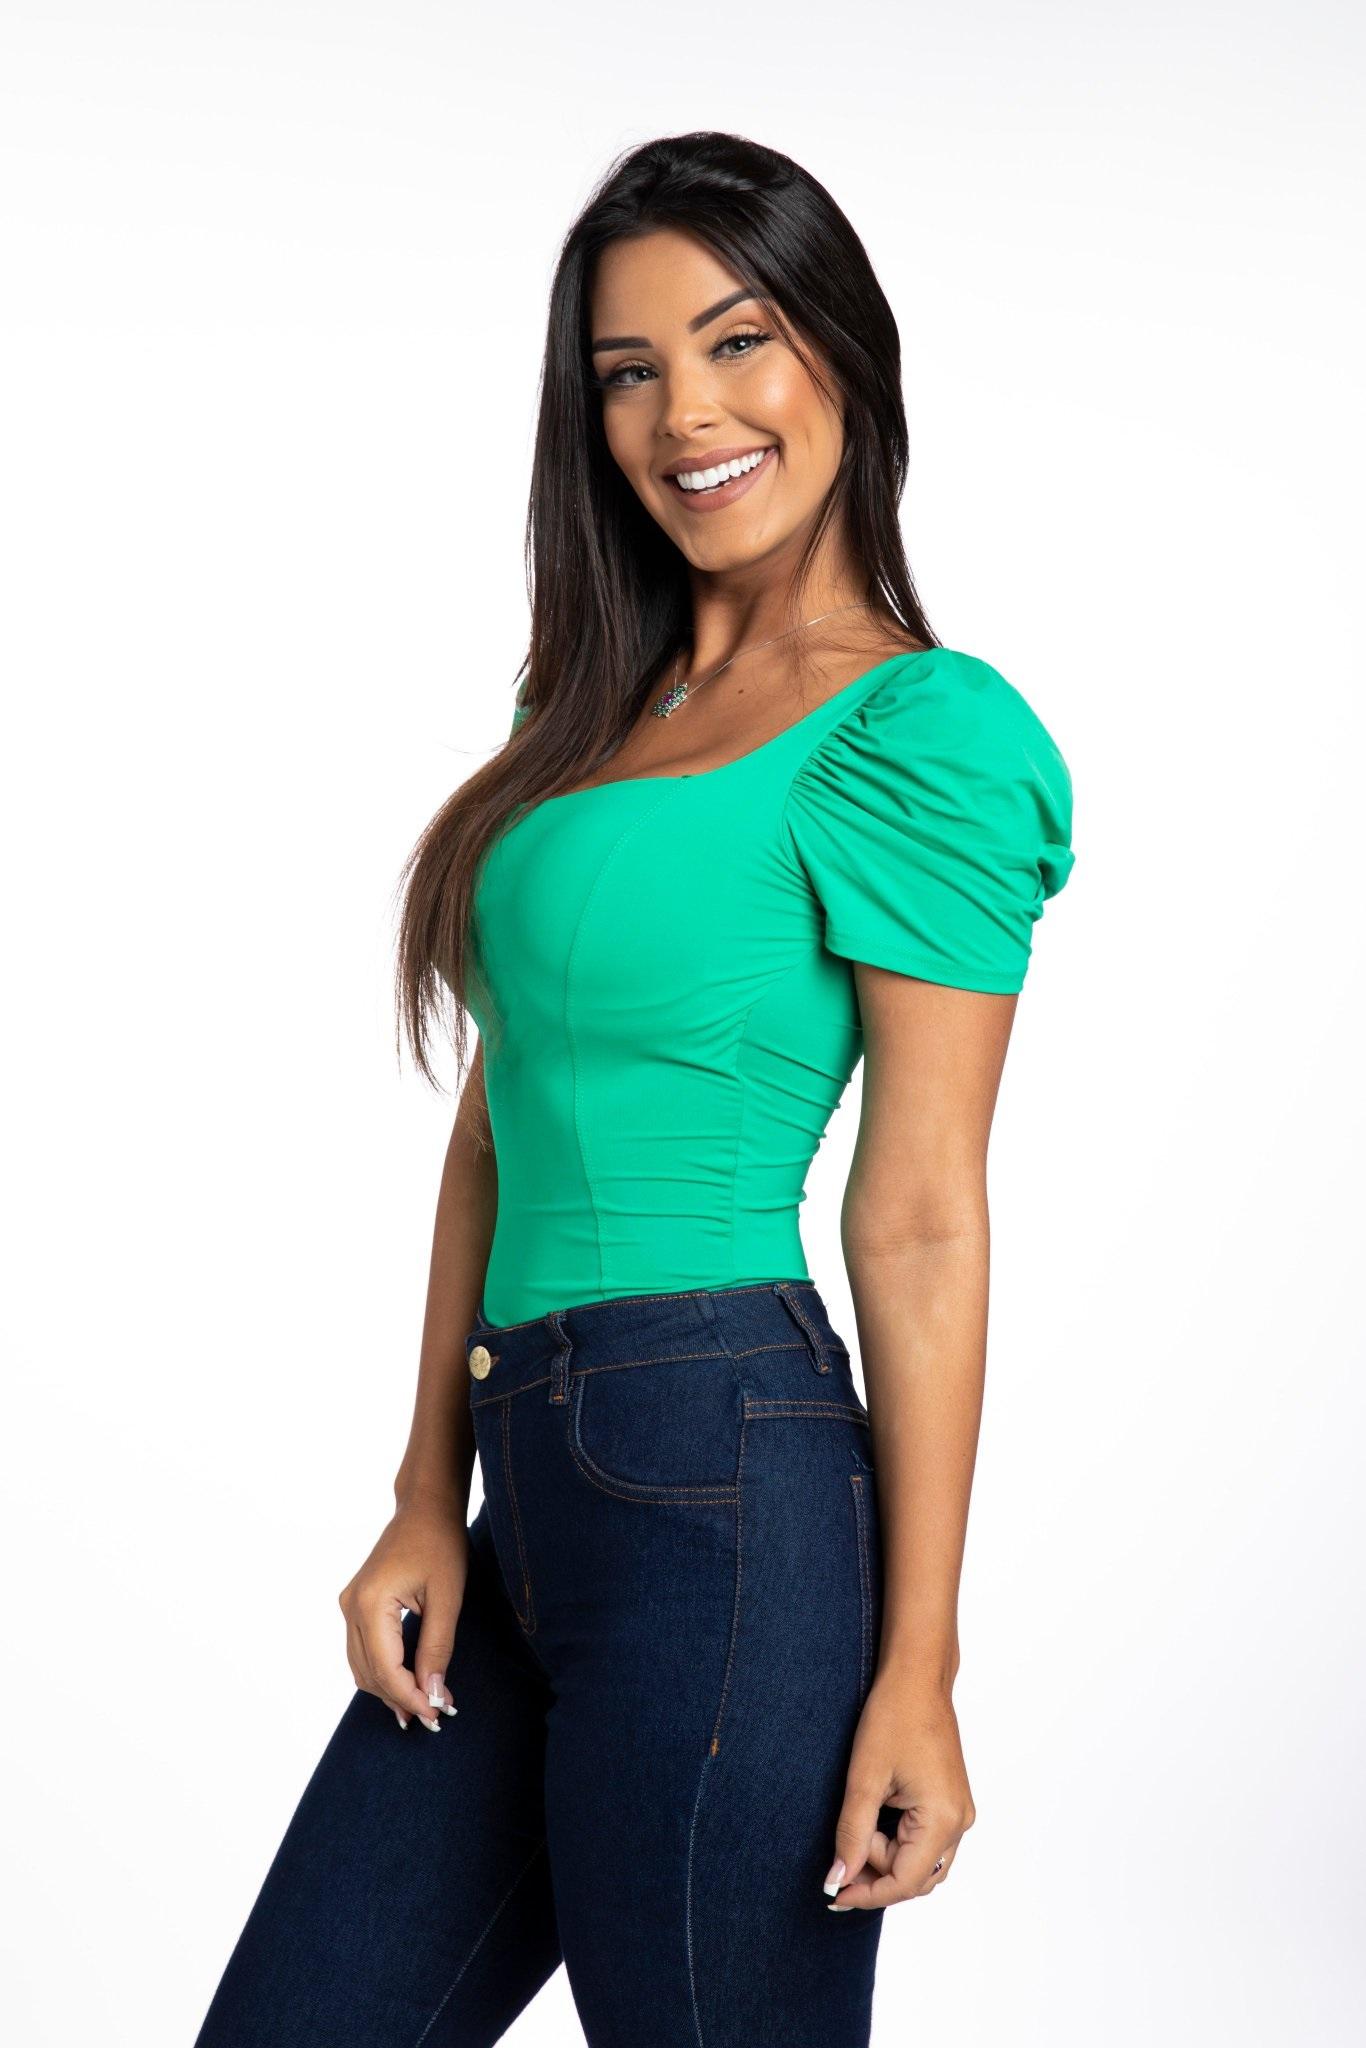 Ivy Moraes